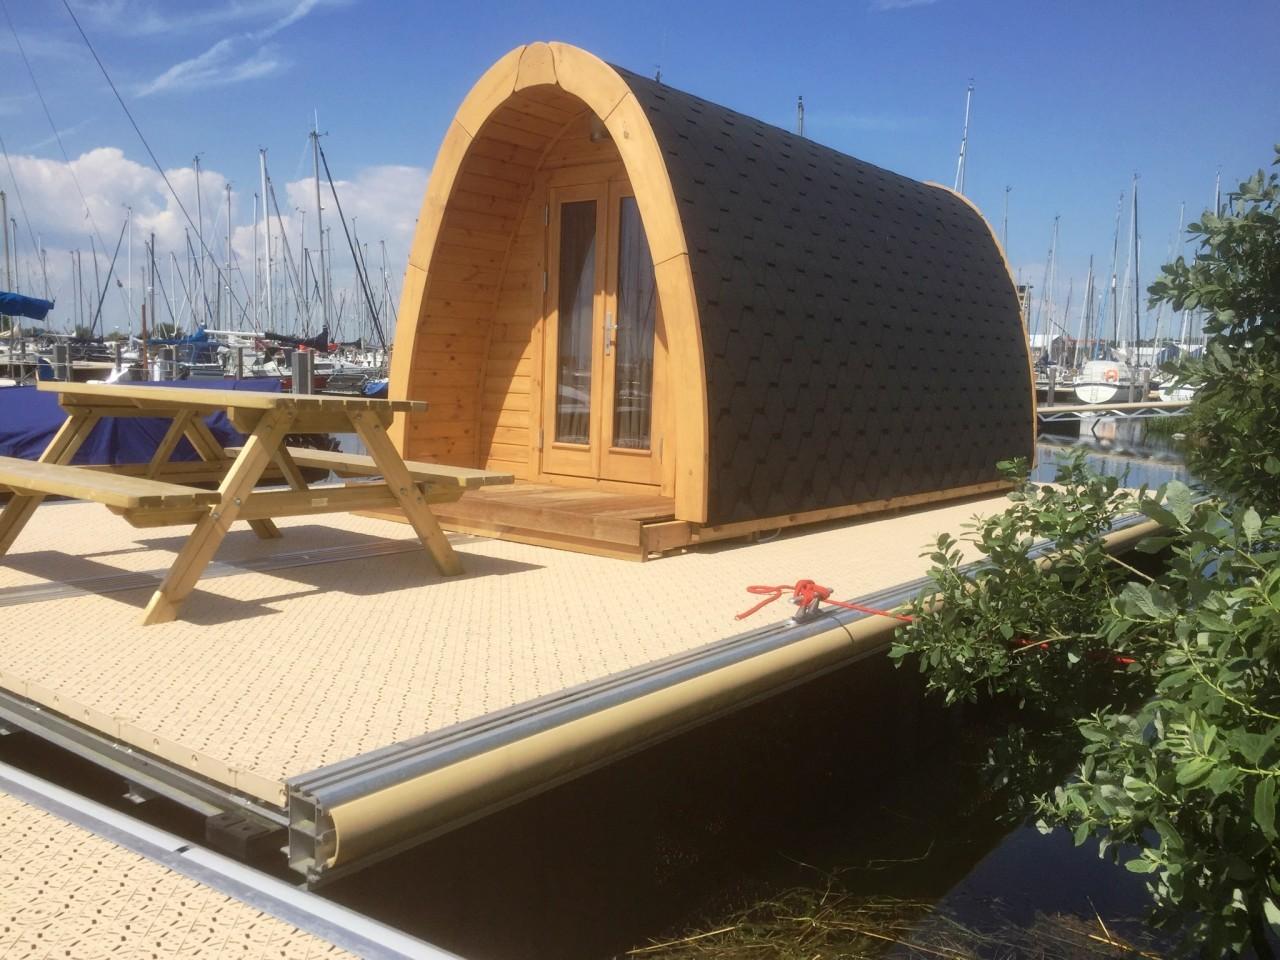 Camping Pod Luxury 240x400 isoliert